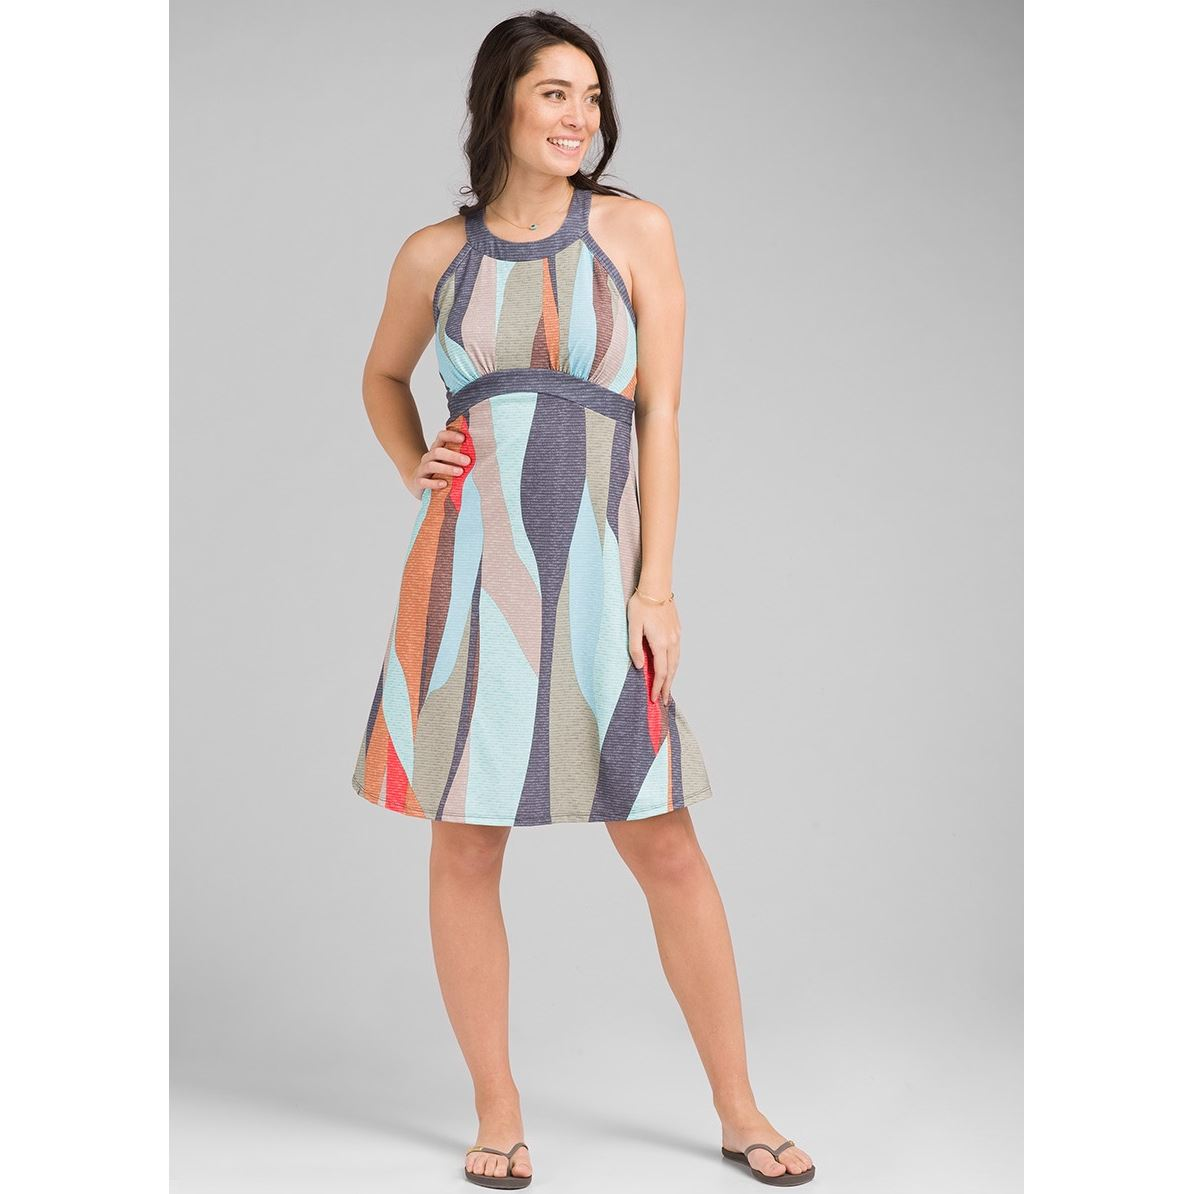 Calexico Dress - Women's